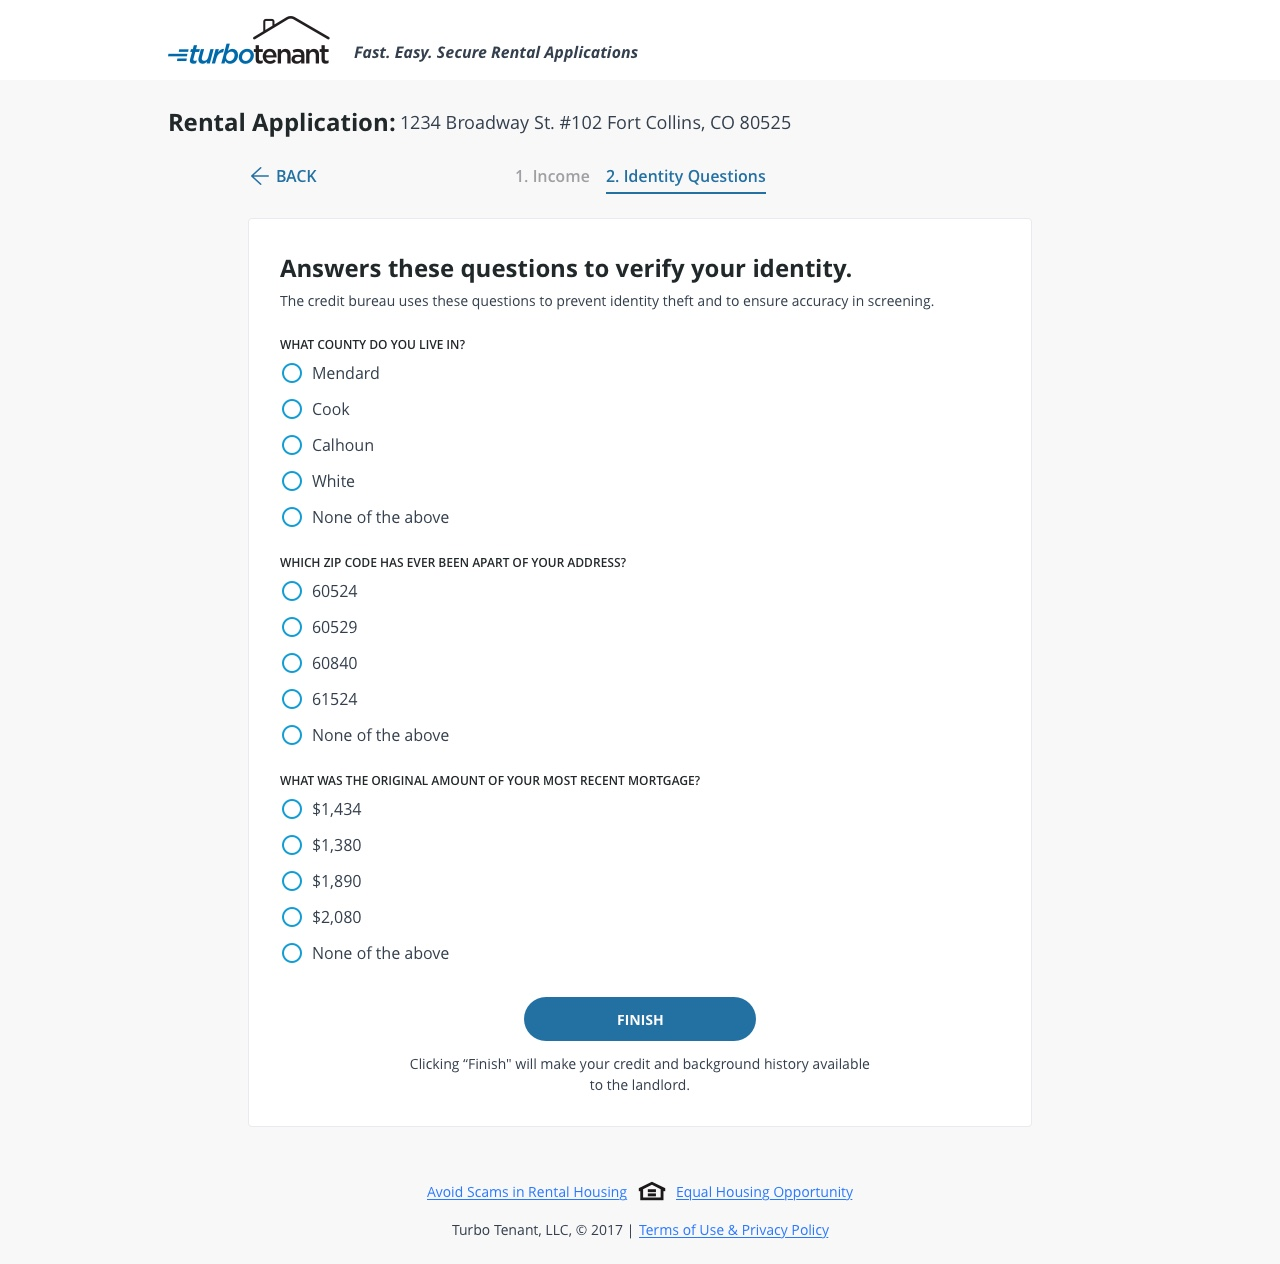 Identity_Questions.jpg